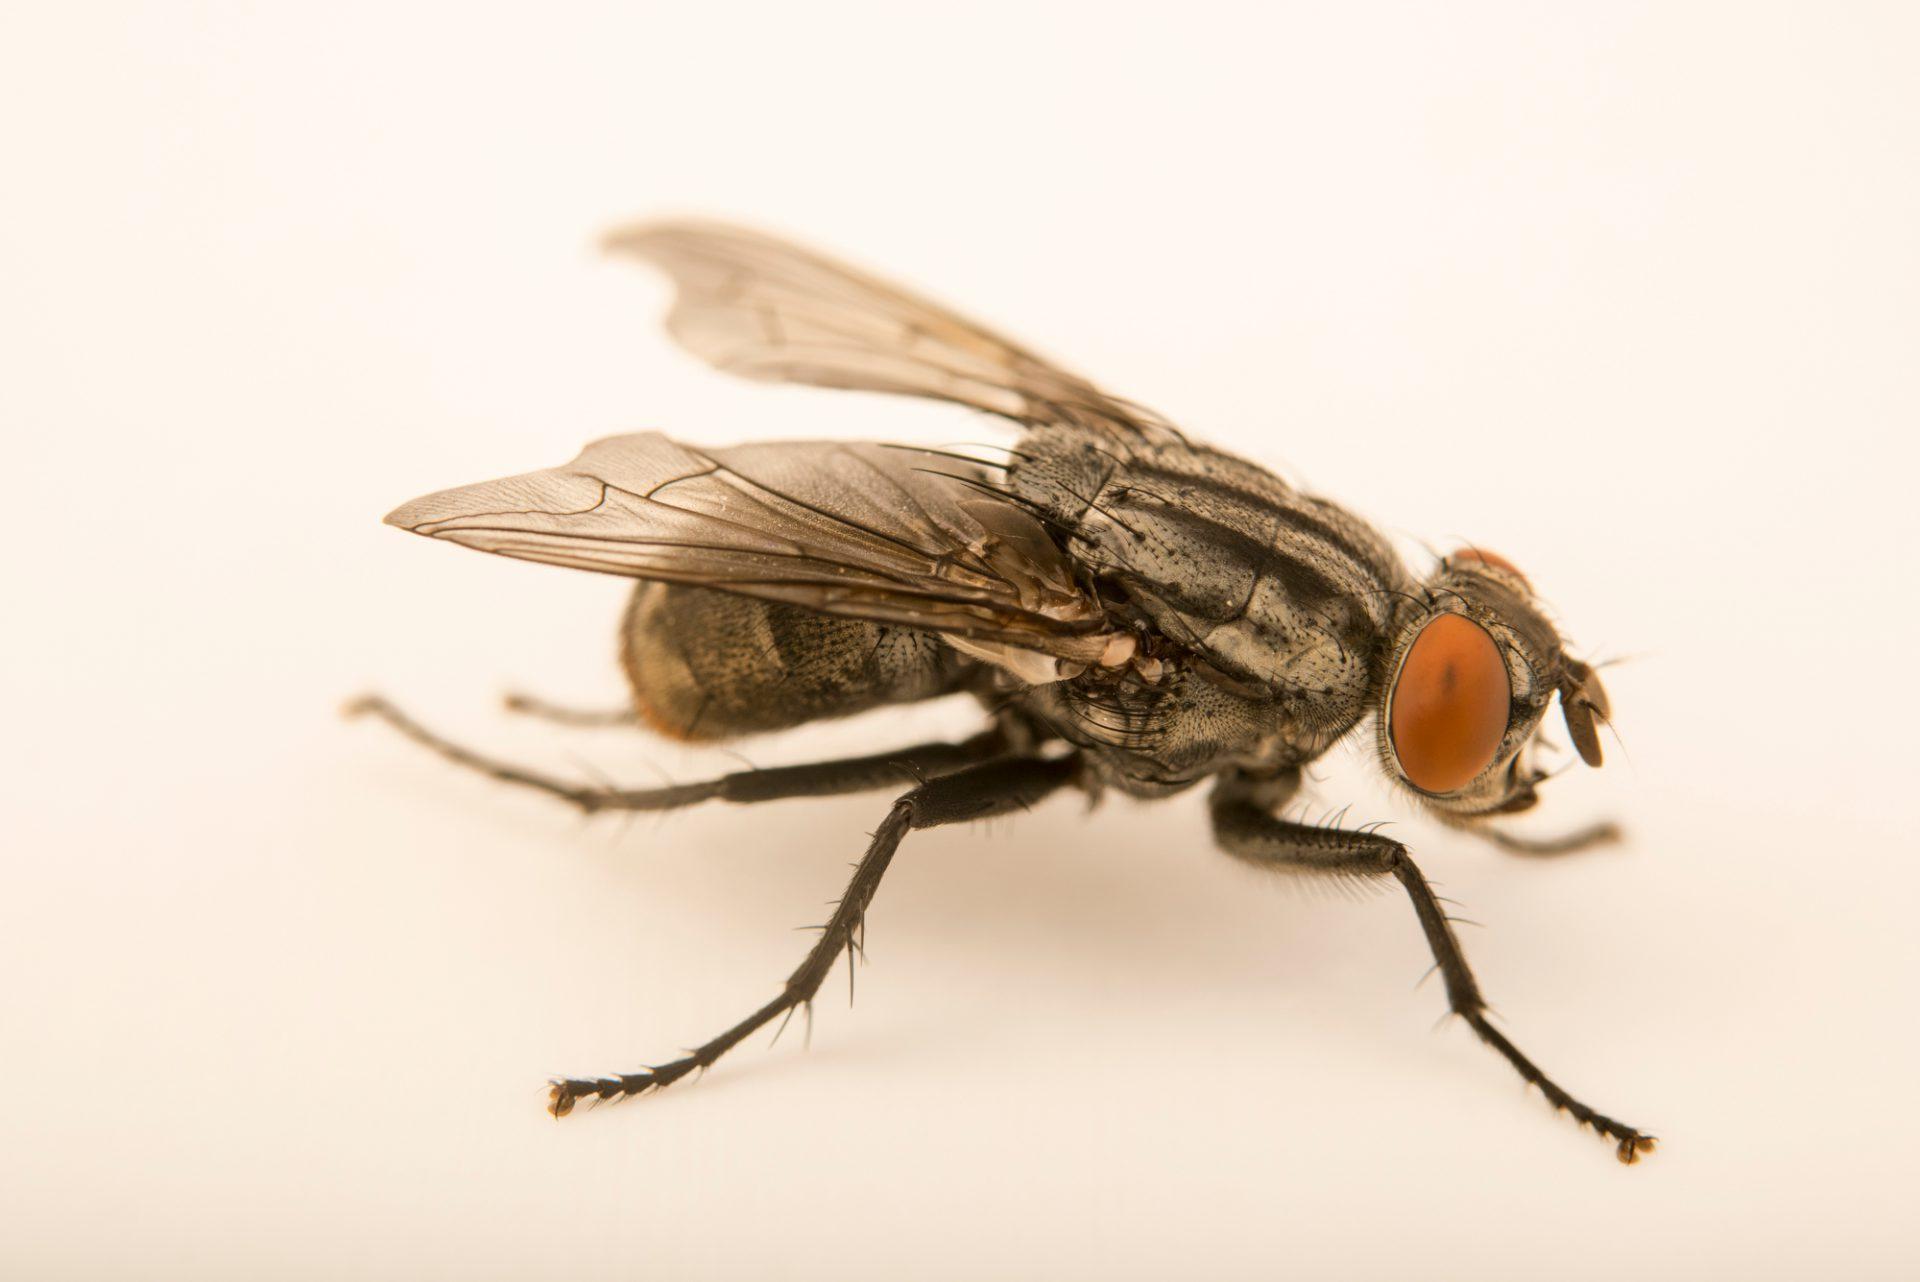 Photo: Grey flesh fly (Sarcophaga bullata) at the Audubon Insectarium.